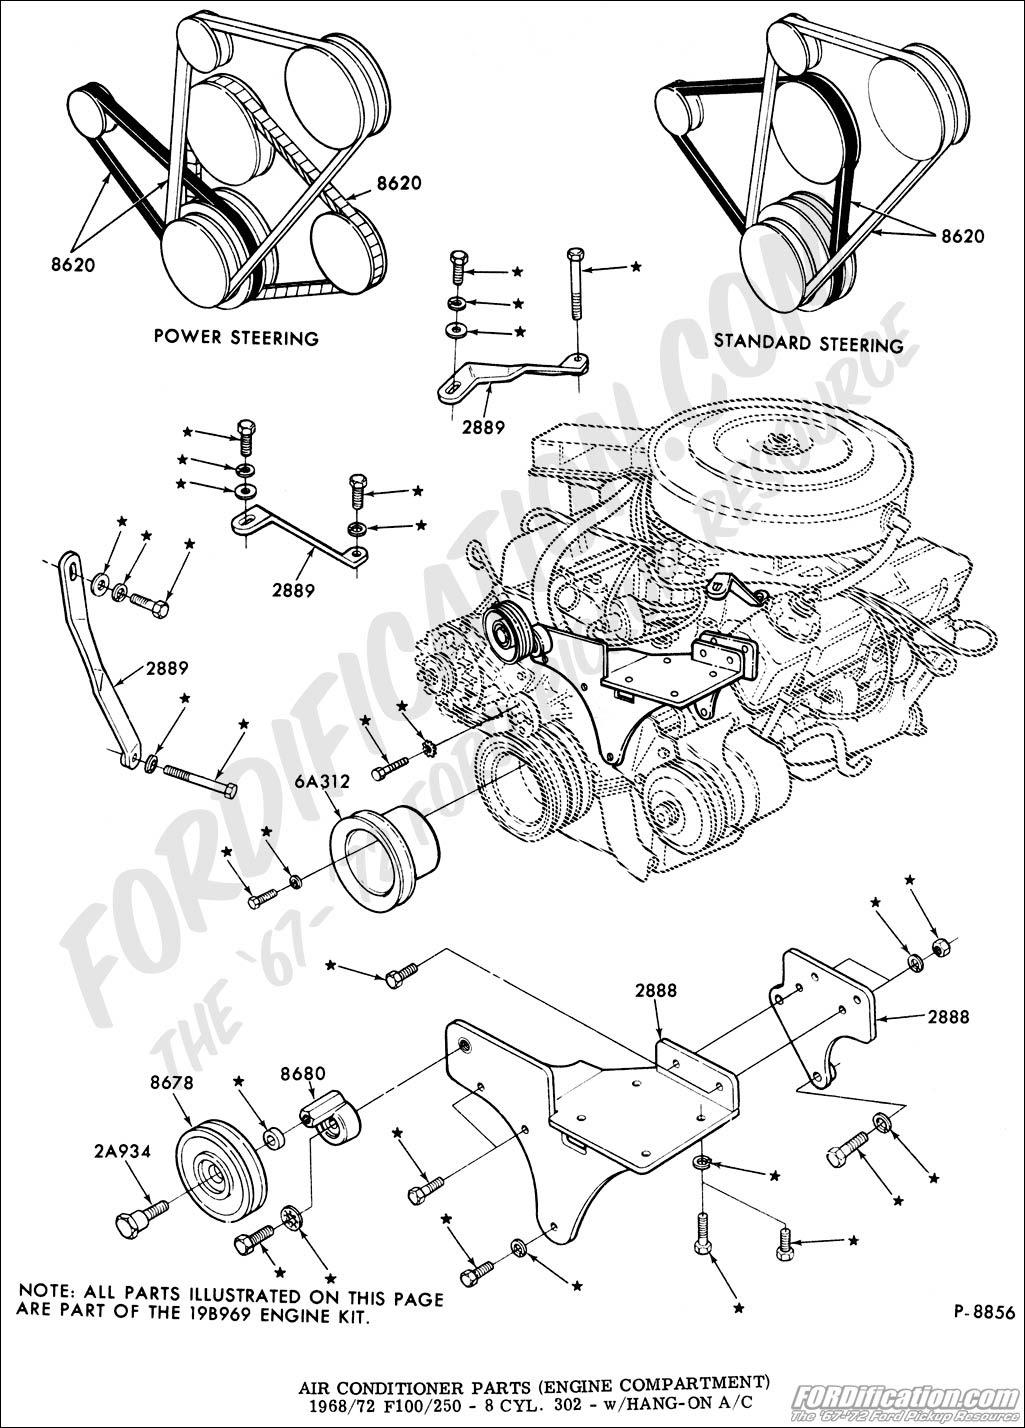 1969 Ford 302 Engine Wiring Diagrams Wiring Diagram Correction Correction Cfcarsnoleggio It